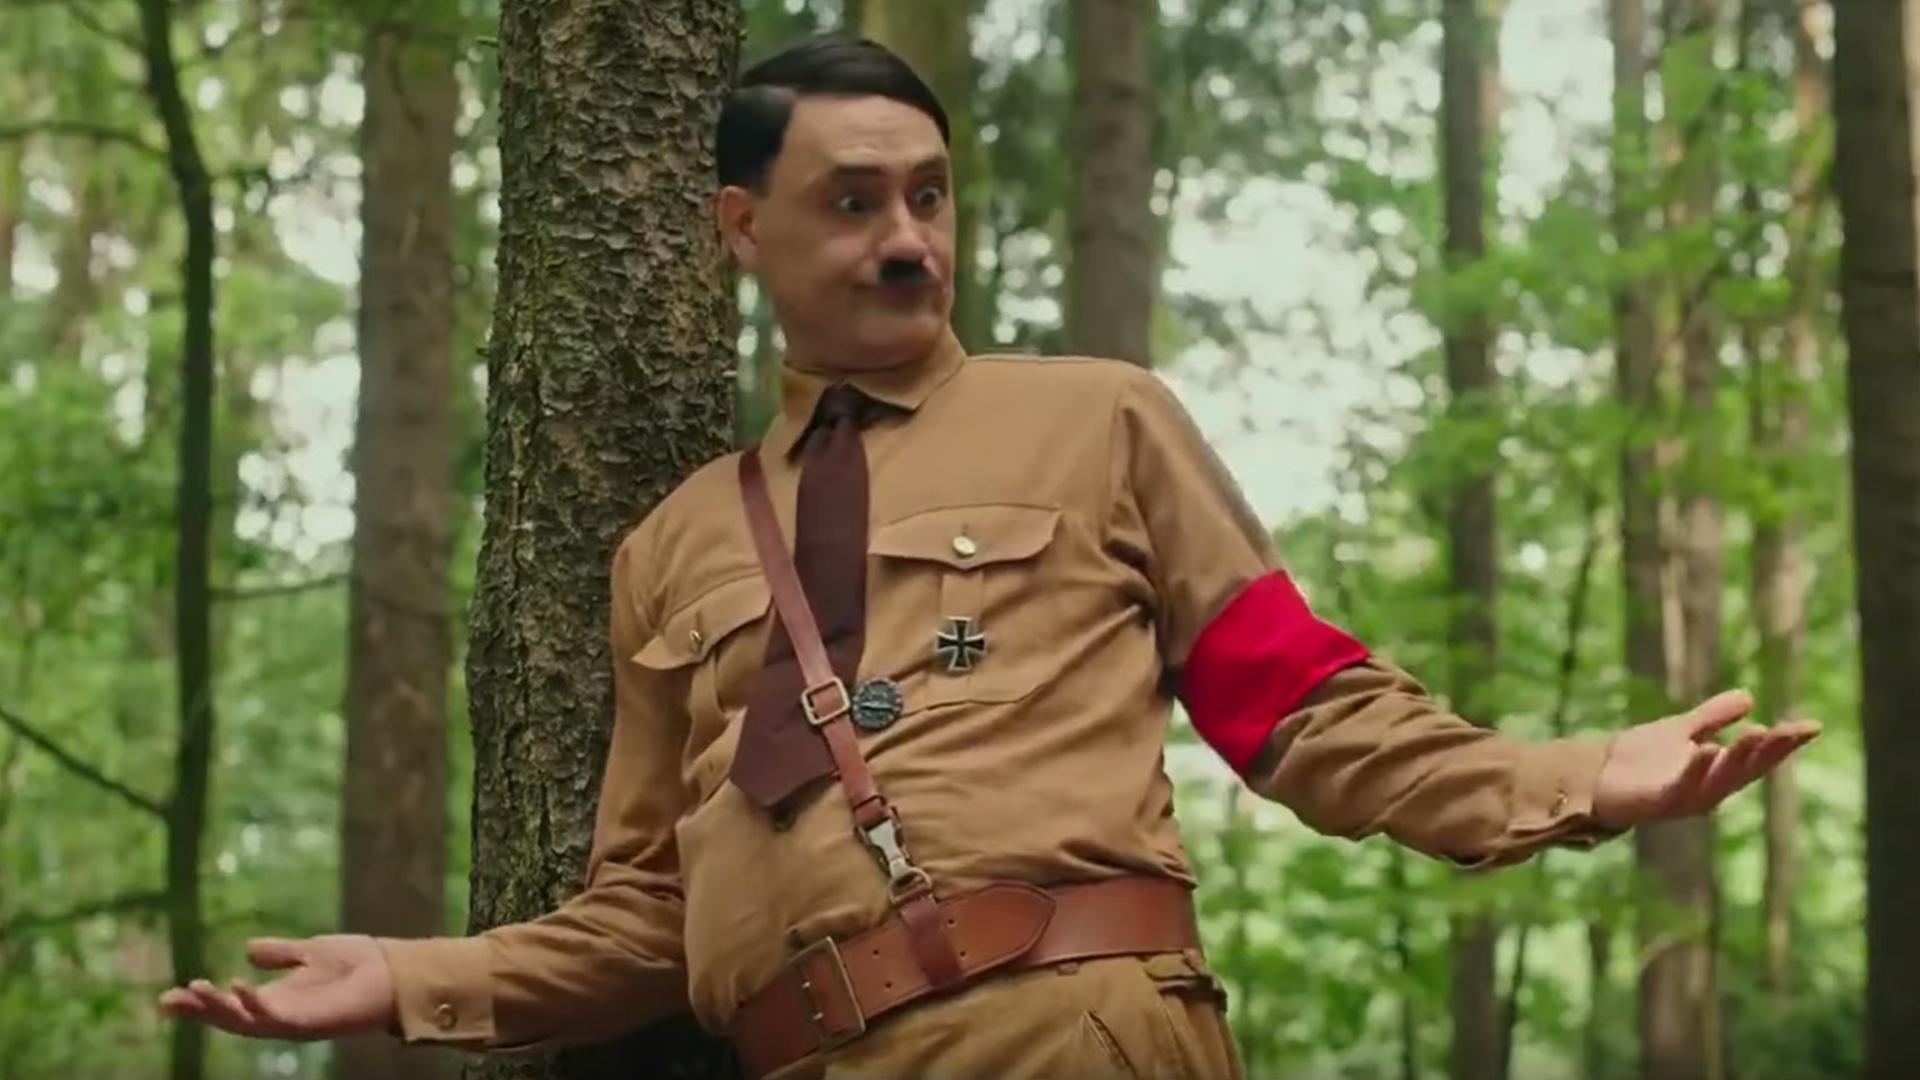 taika-waititi-plays-an-imaginary-adolf-hitler-in-first-trailer-for-his-dark-satire-comedy-jojo-rabbit-social.jpg